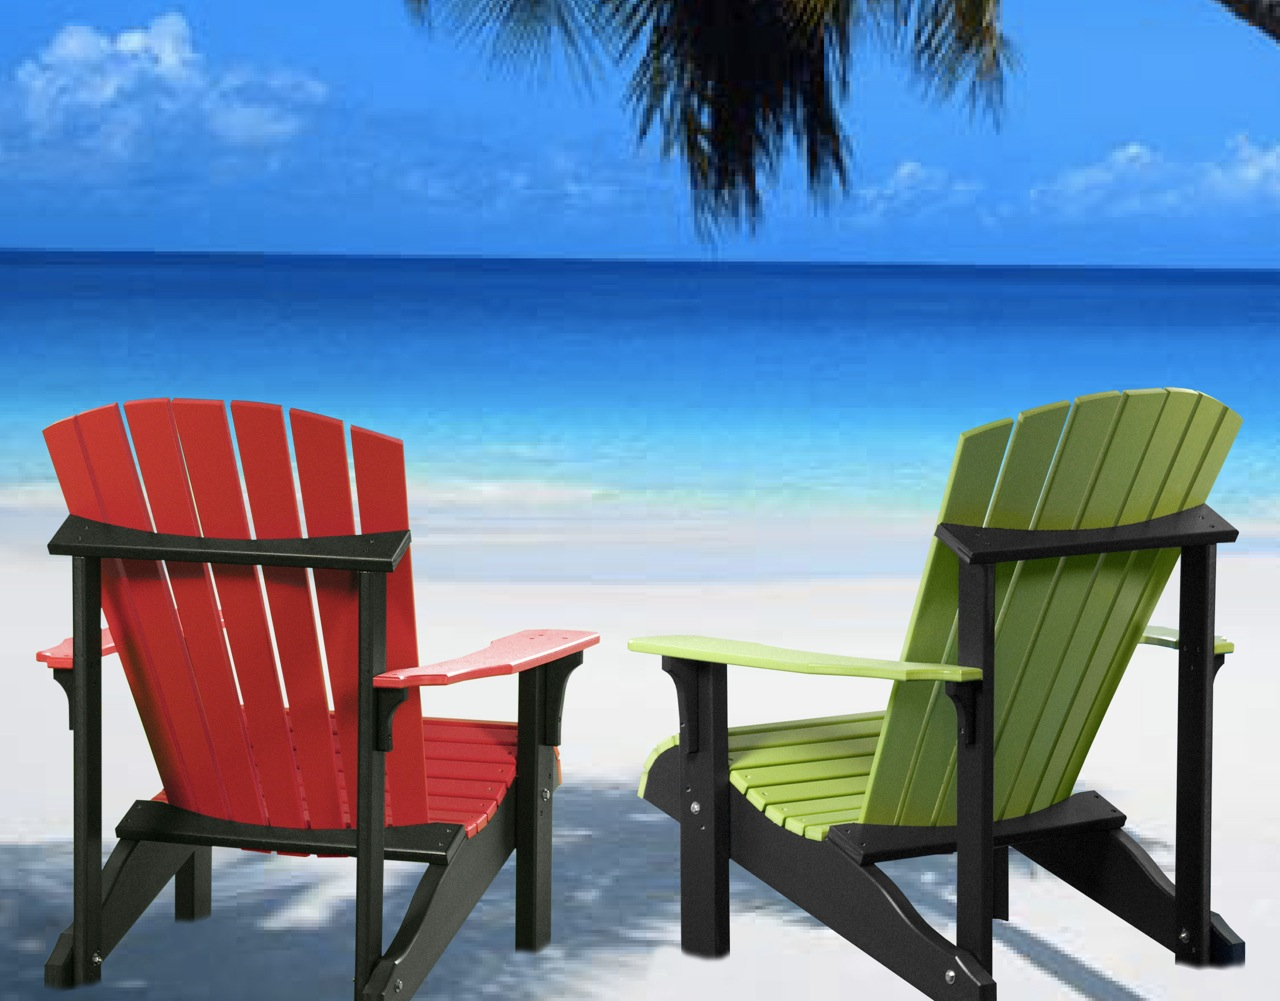 47+] Adirondack Chairs on Beach Wallpapers on WallpaperSafari